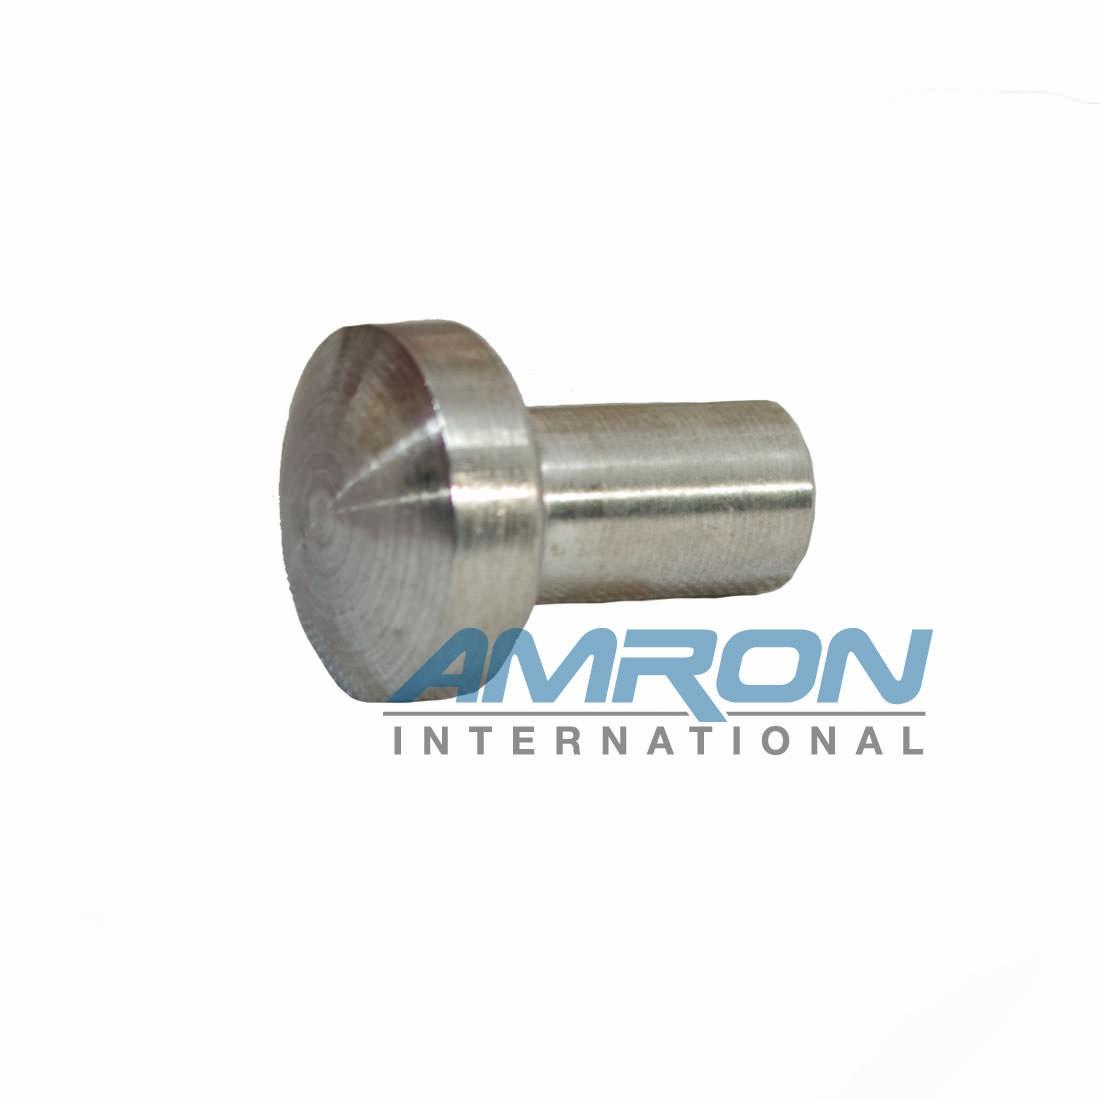 Kirby Morgan 550-059 Spacer